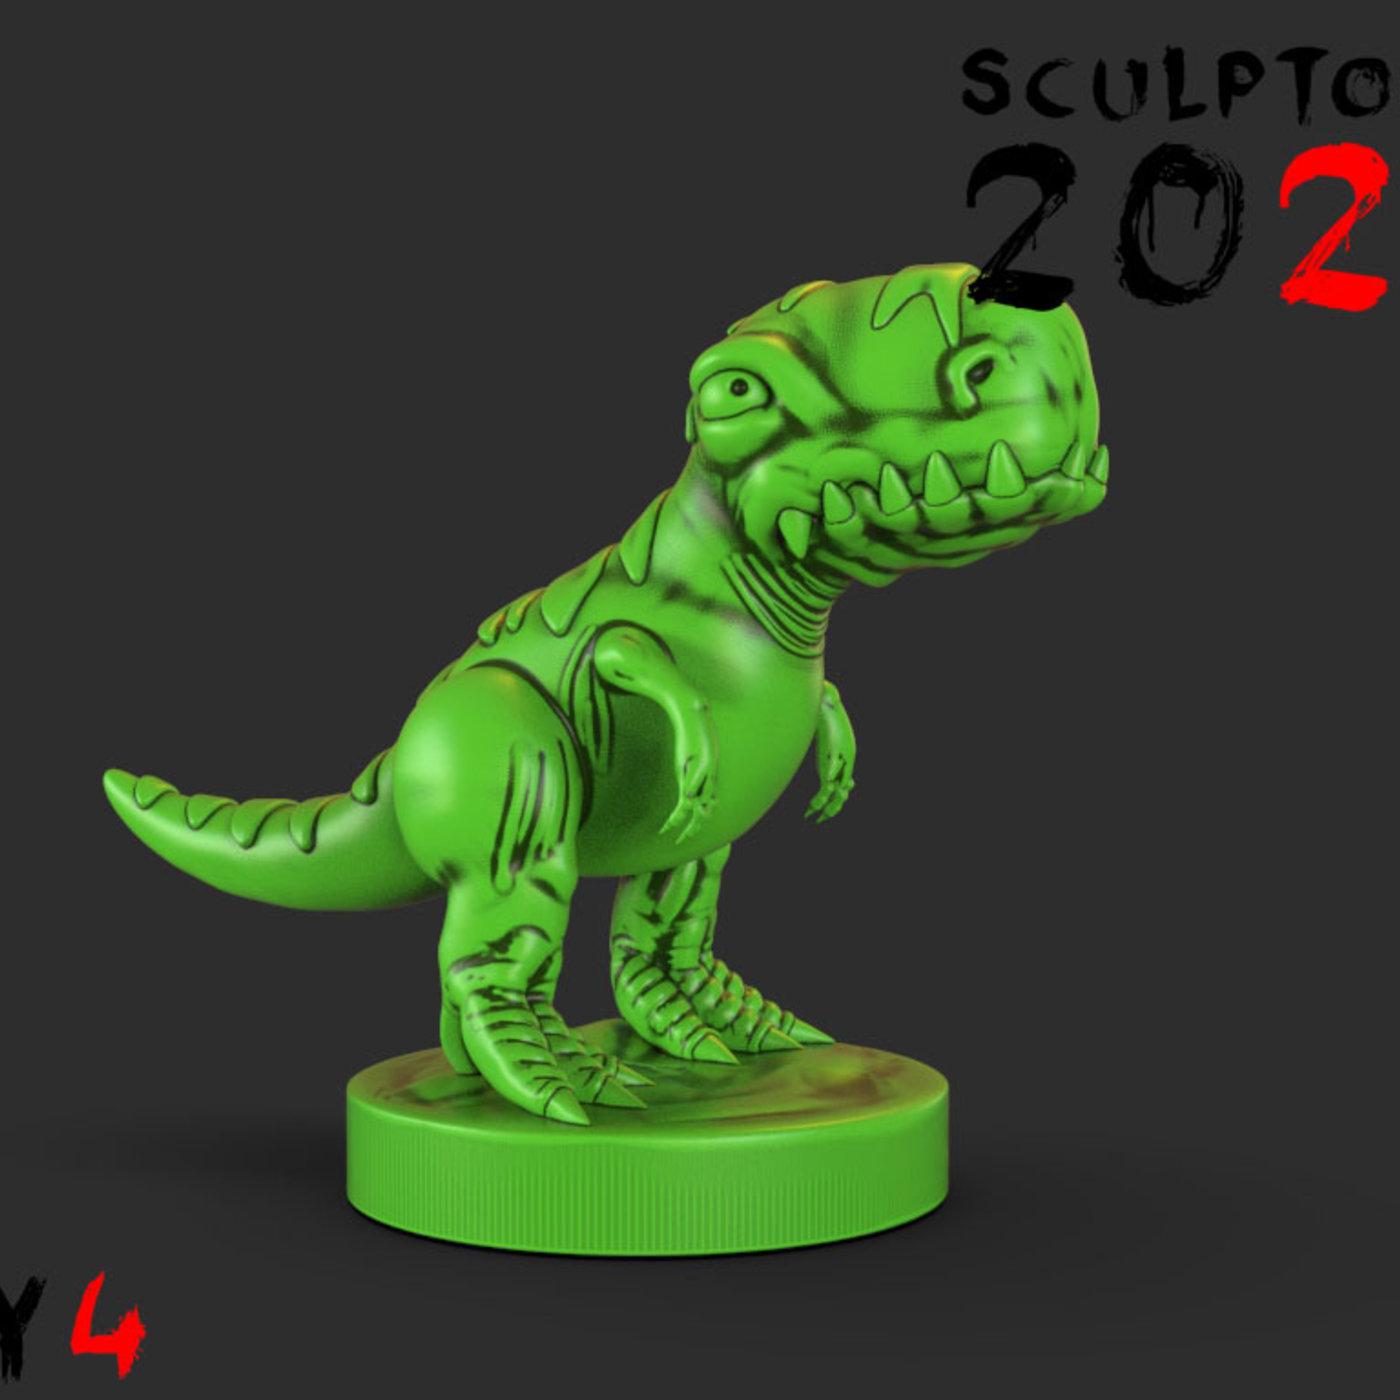 Sculptober Day 04